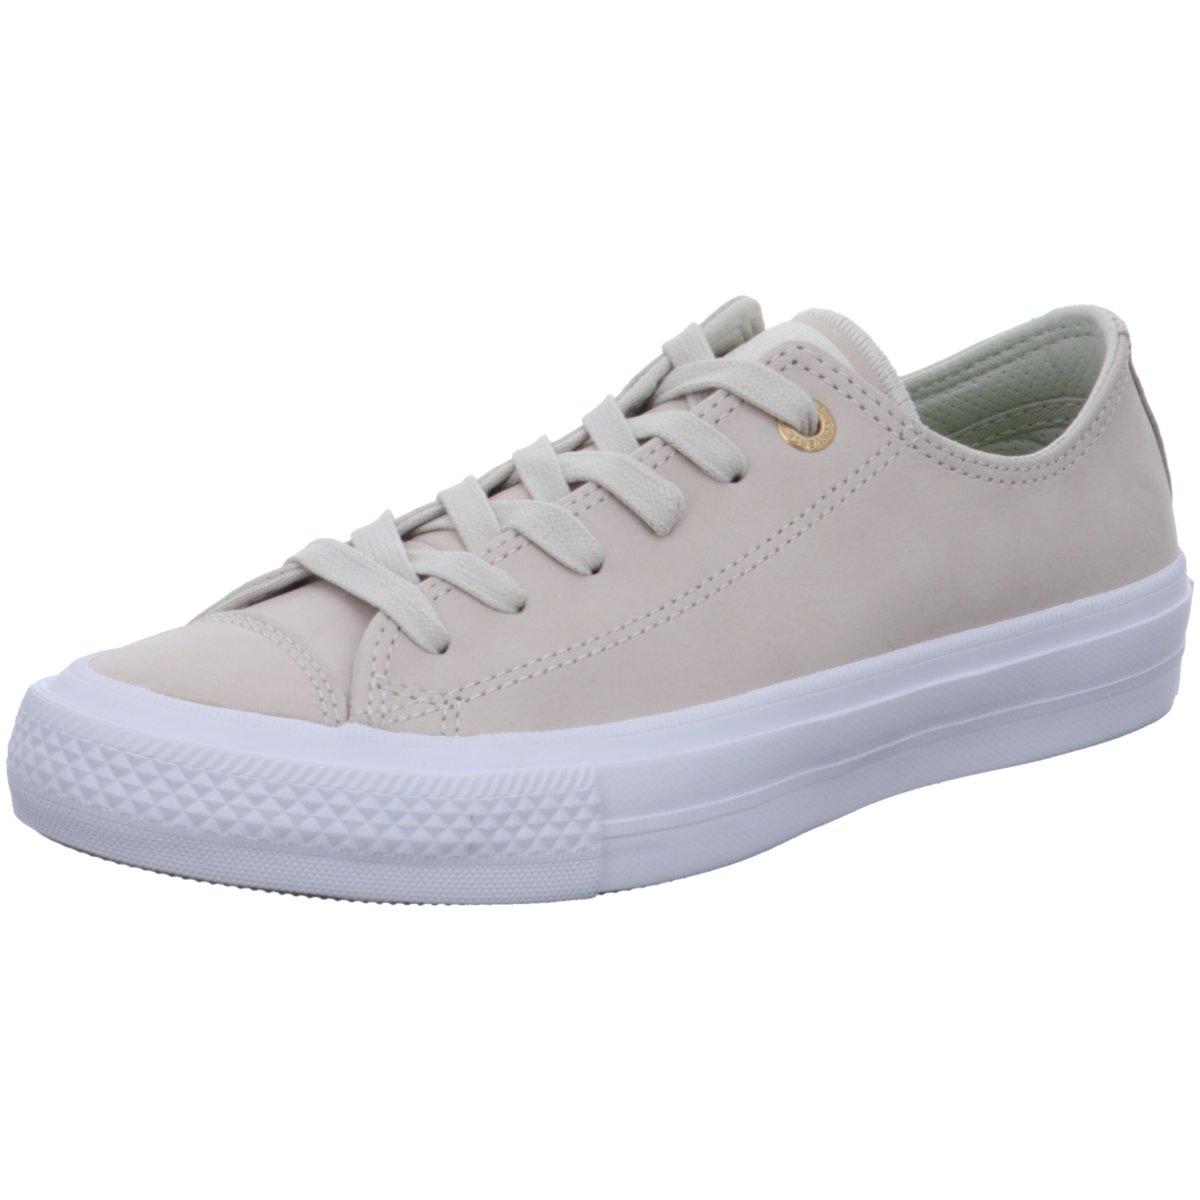 NEU Converse Herren Sneaker Chuck Taylor All Star II 555956C beige 253202